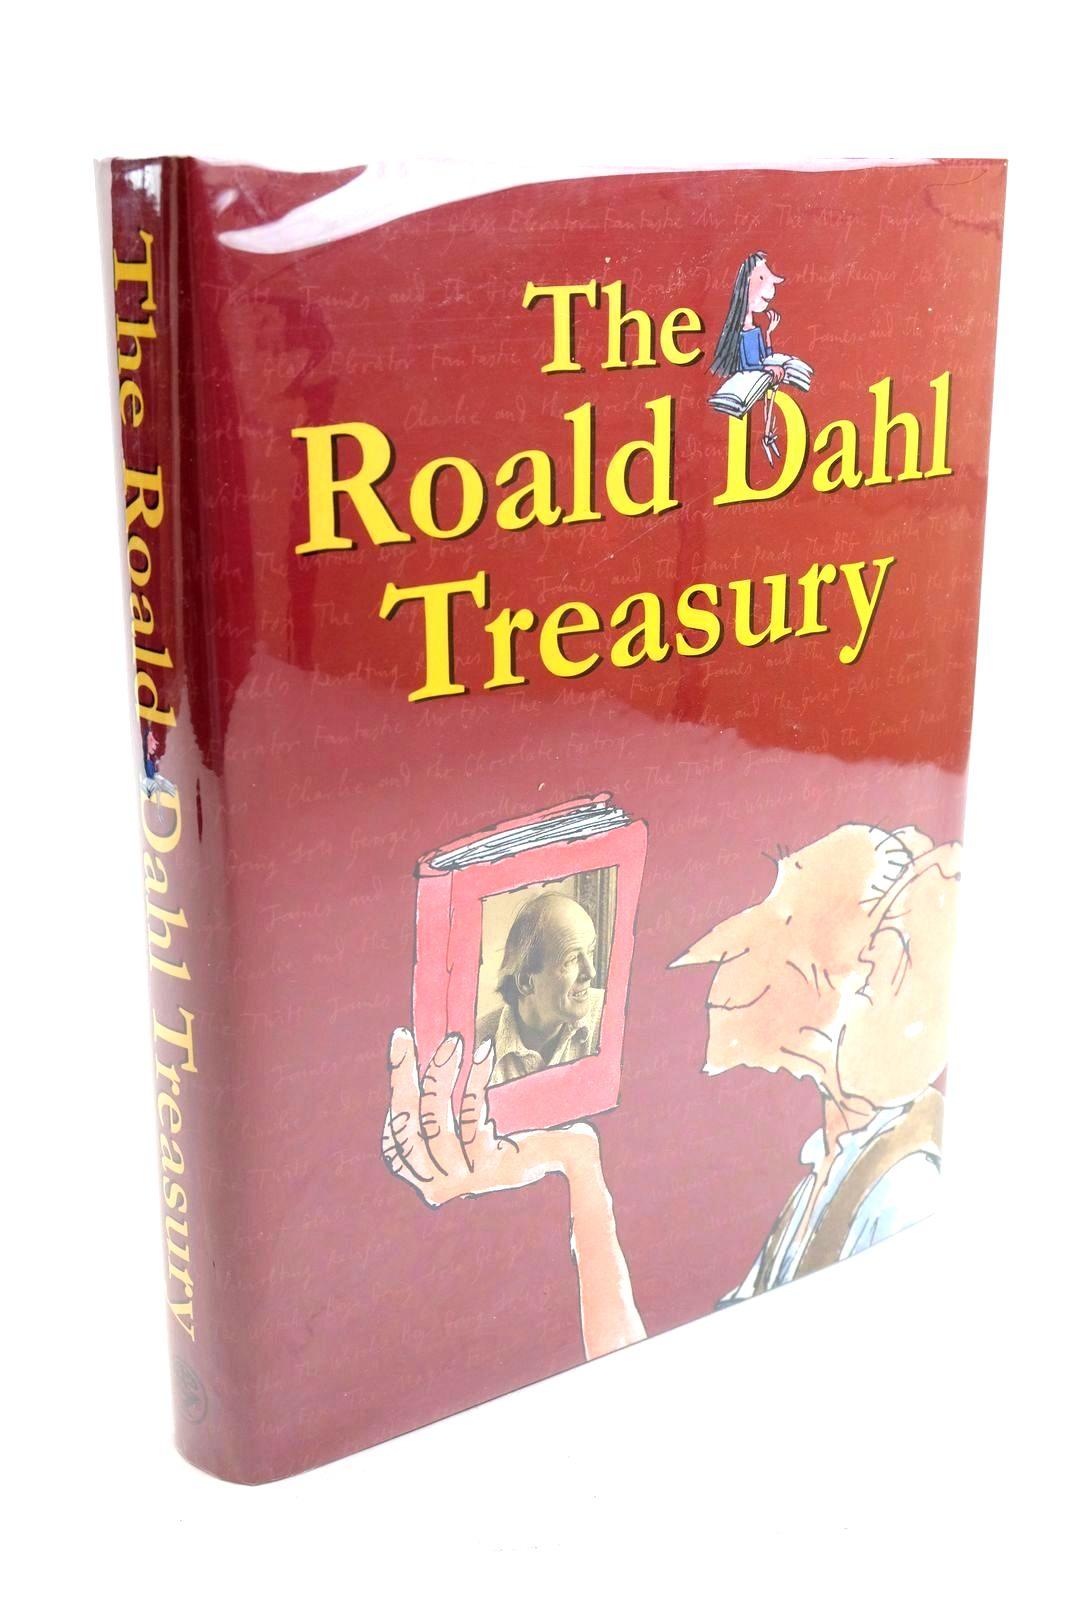 Photo of THE ROALD DAHL TREASURY- Stock Number: 1321016